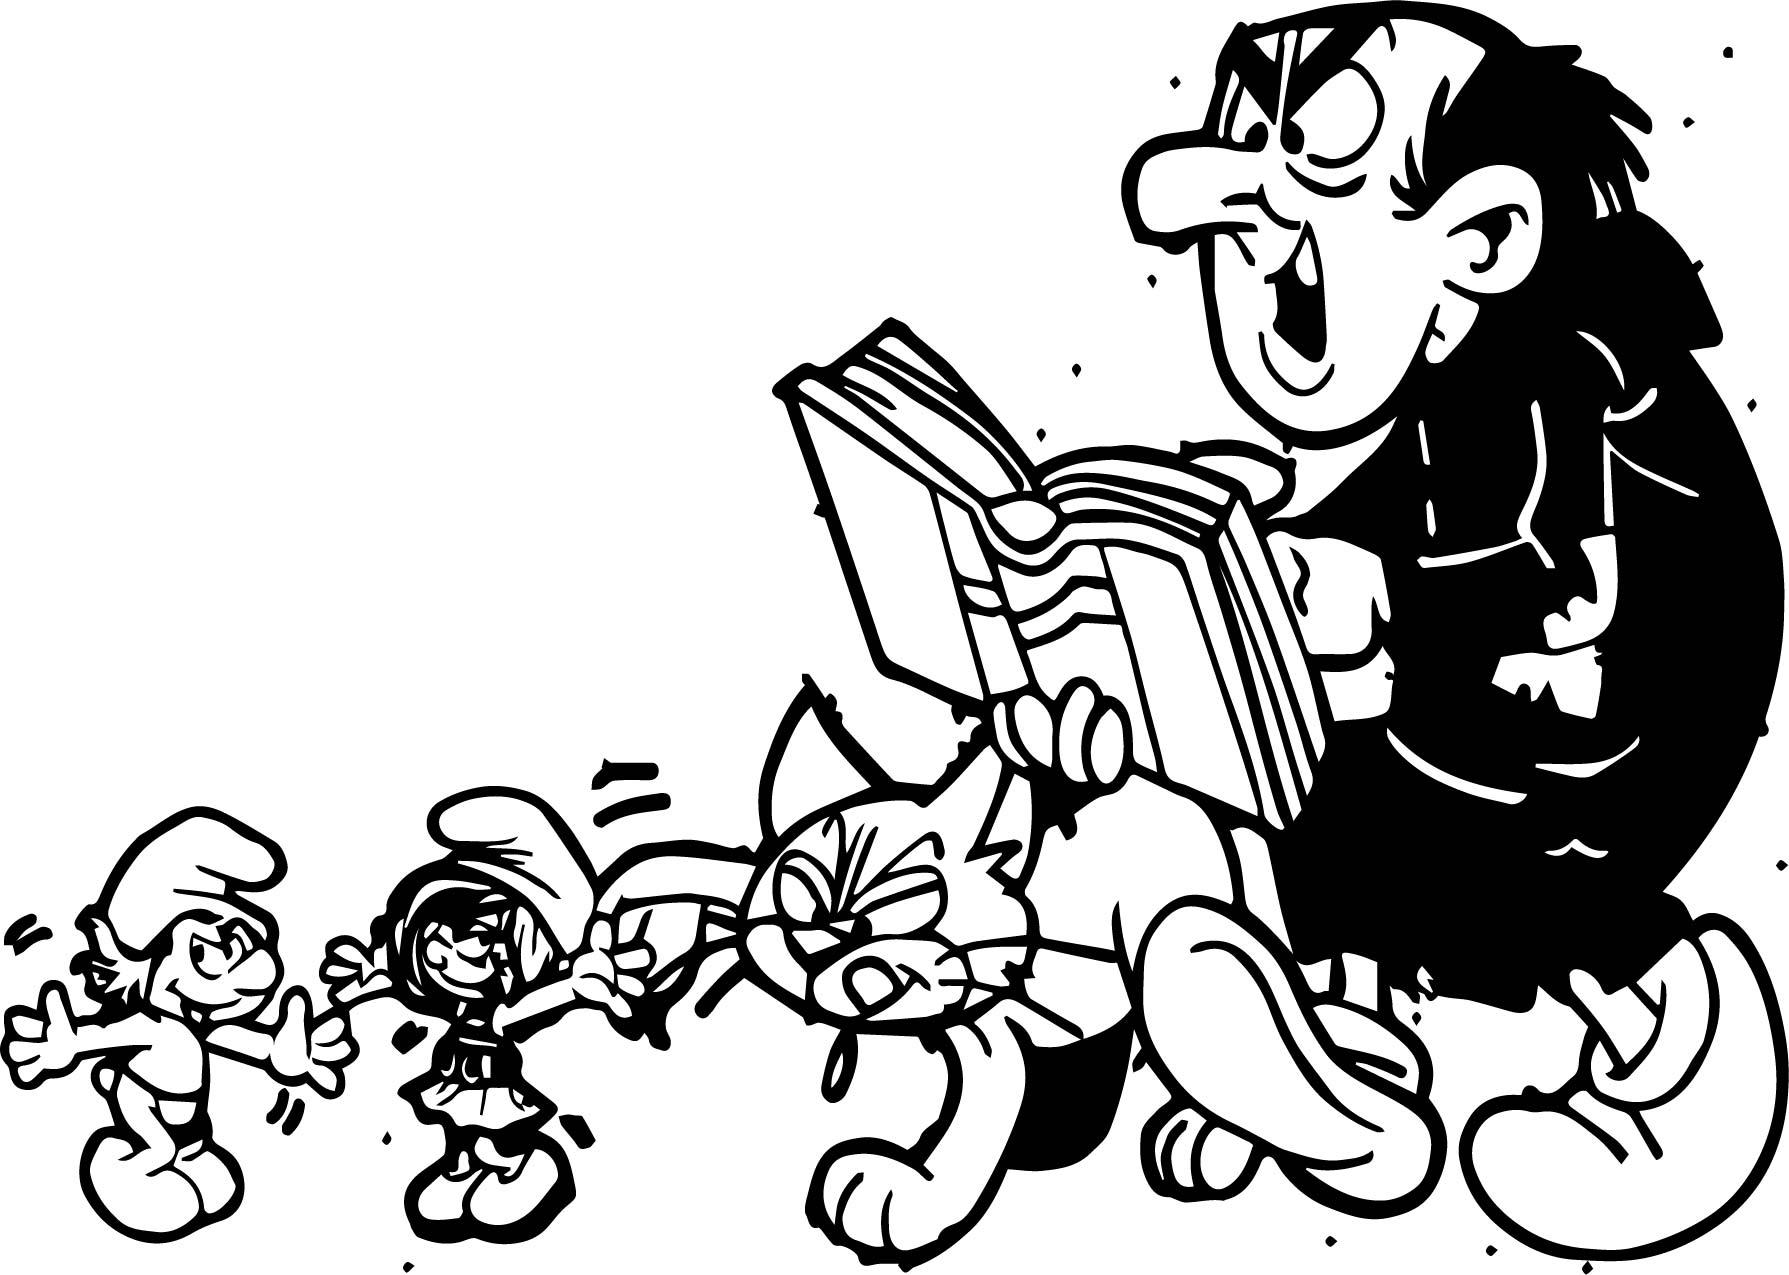 Gargamel Azrael Smurfette And Hefty Smurf Coloring Page | Wecoloringpage